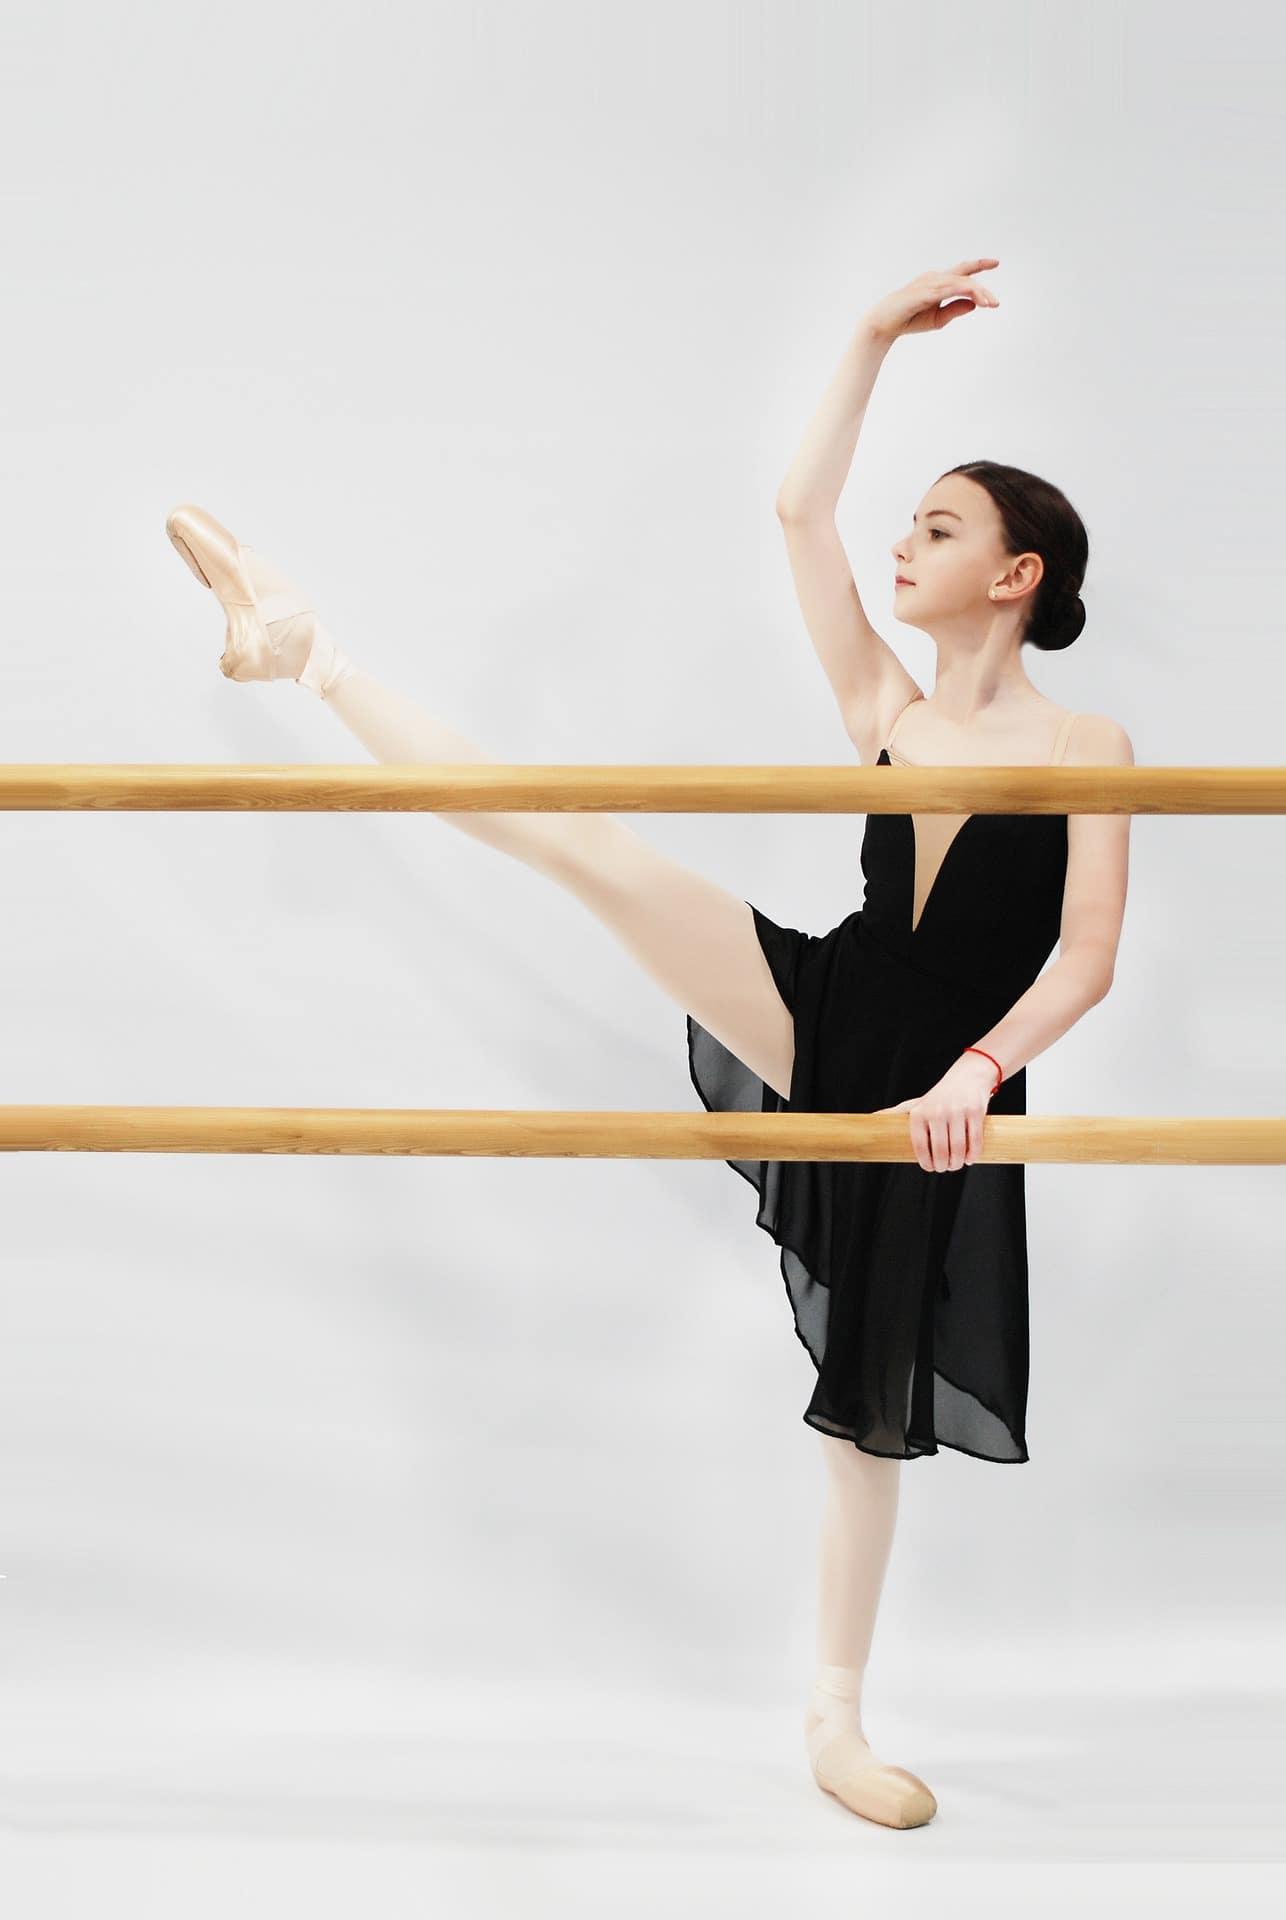 Chiropractor for Dancers: Carlin Chiropractic